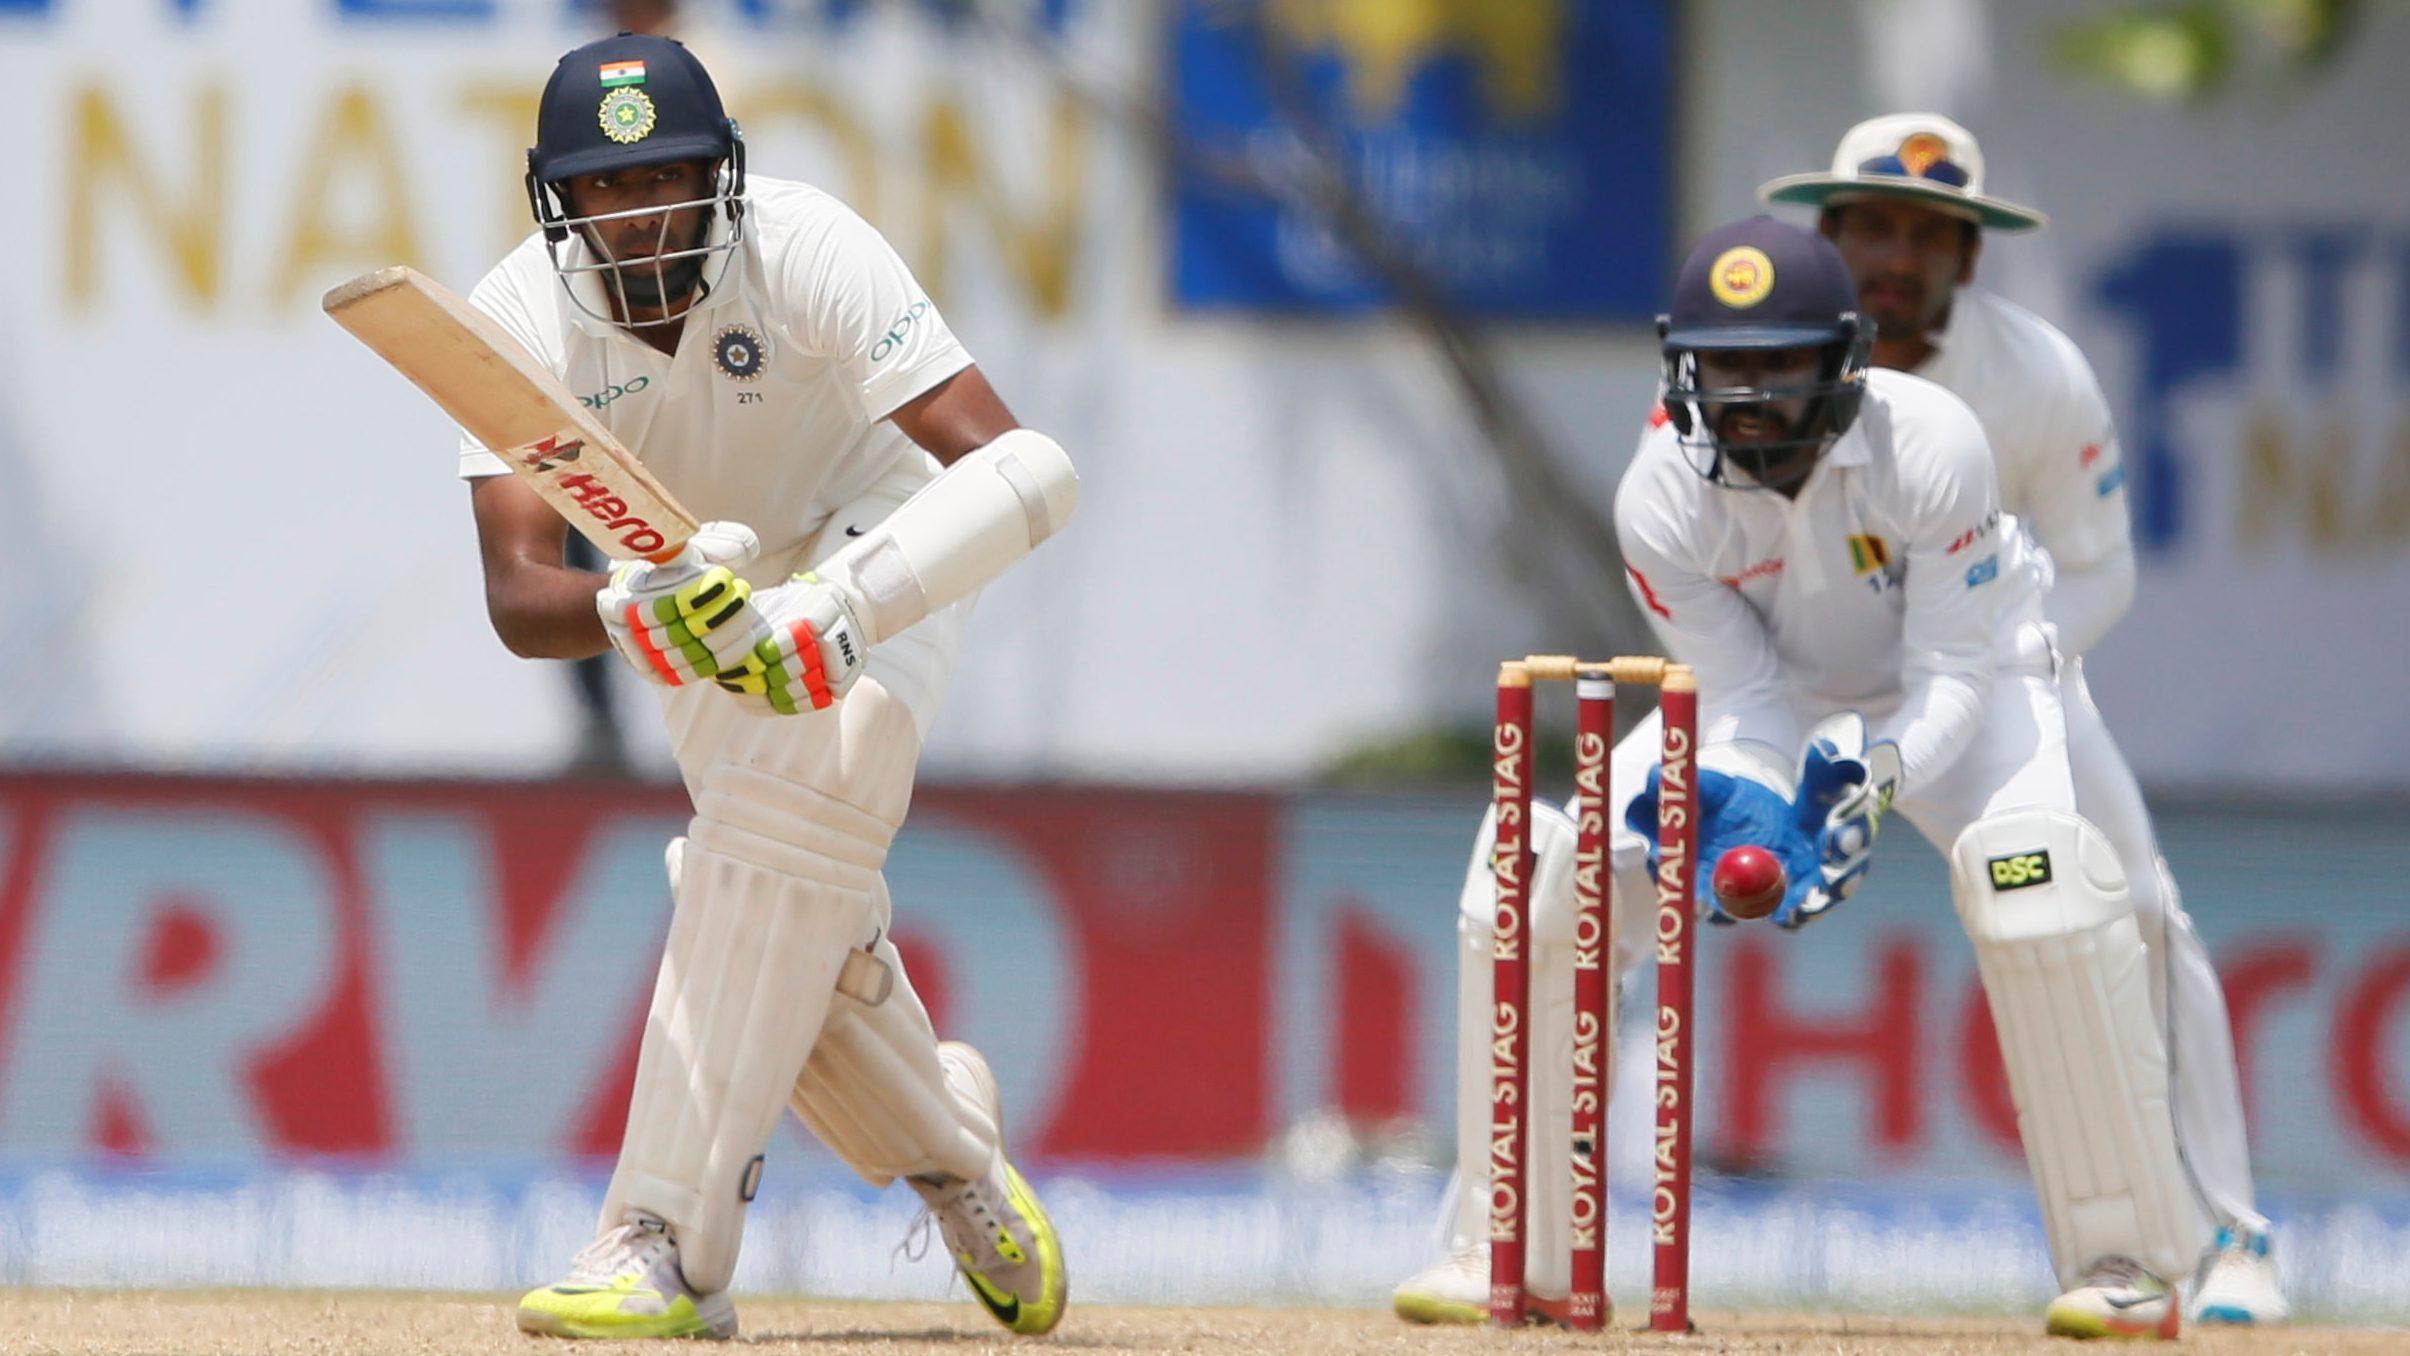 Ravichandran Ashwin plays a shot in a test cricket game